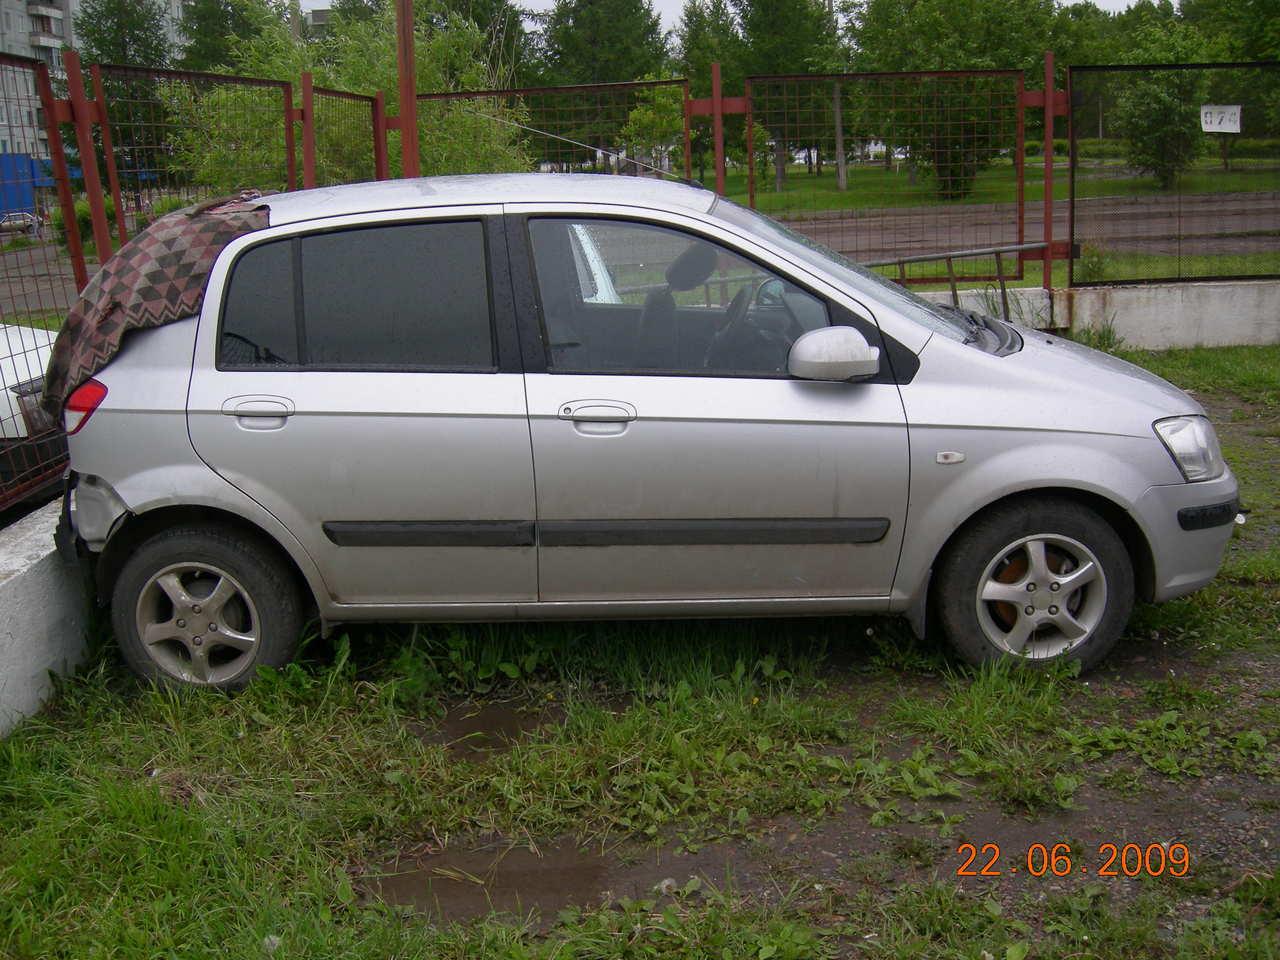 2003 Hyundai Getz Pictures 1 4l Gasoline Ff Automatic